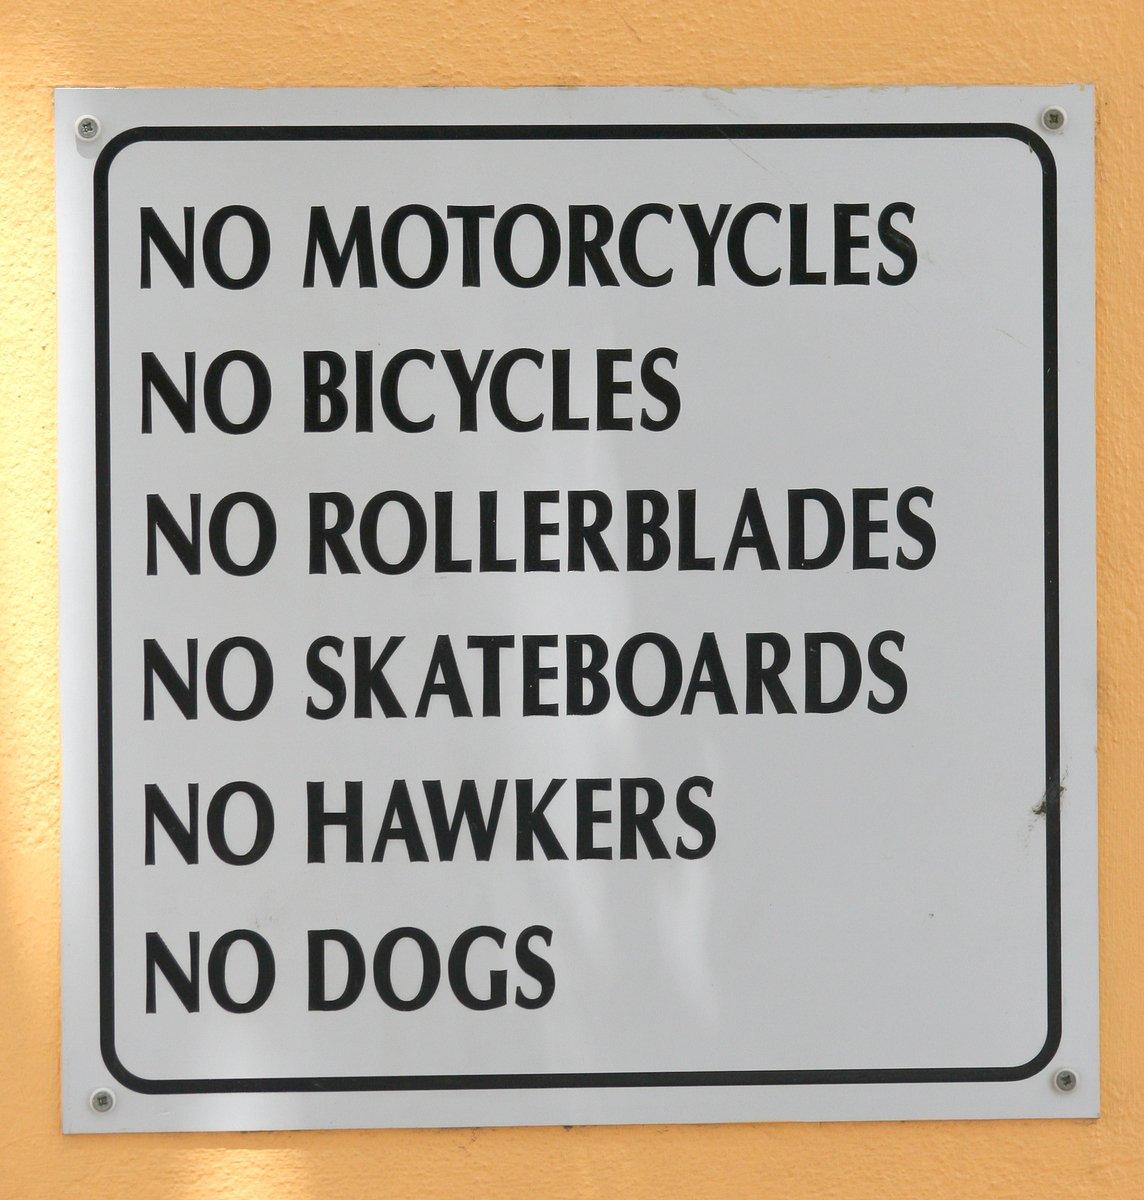 No rollerblades